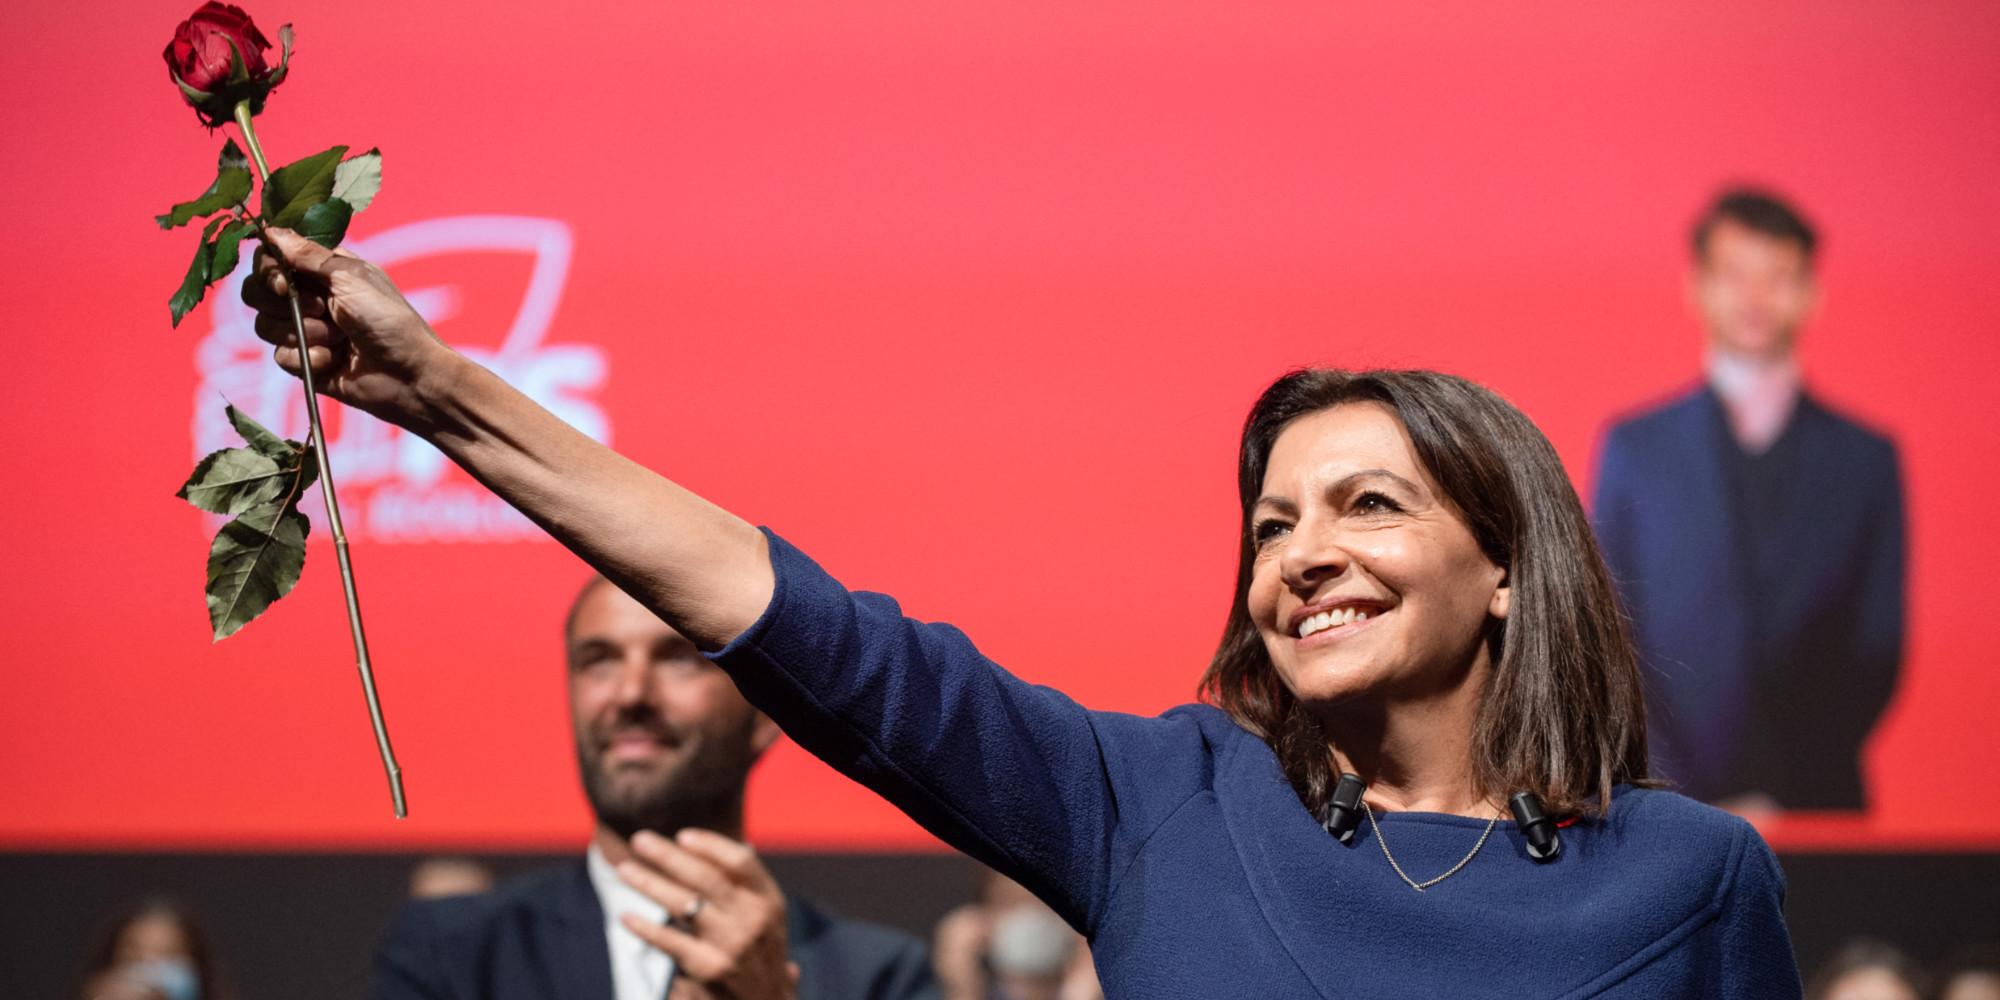 A Lille, les militants PS reboostés par le meeting Hidalgo